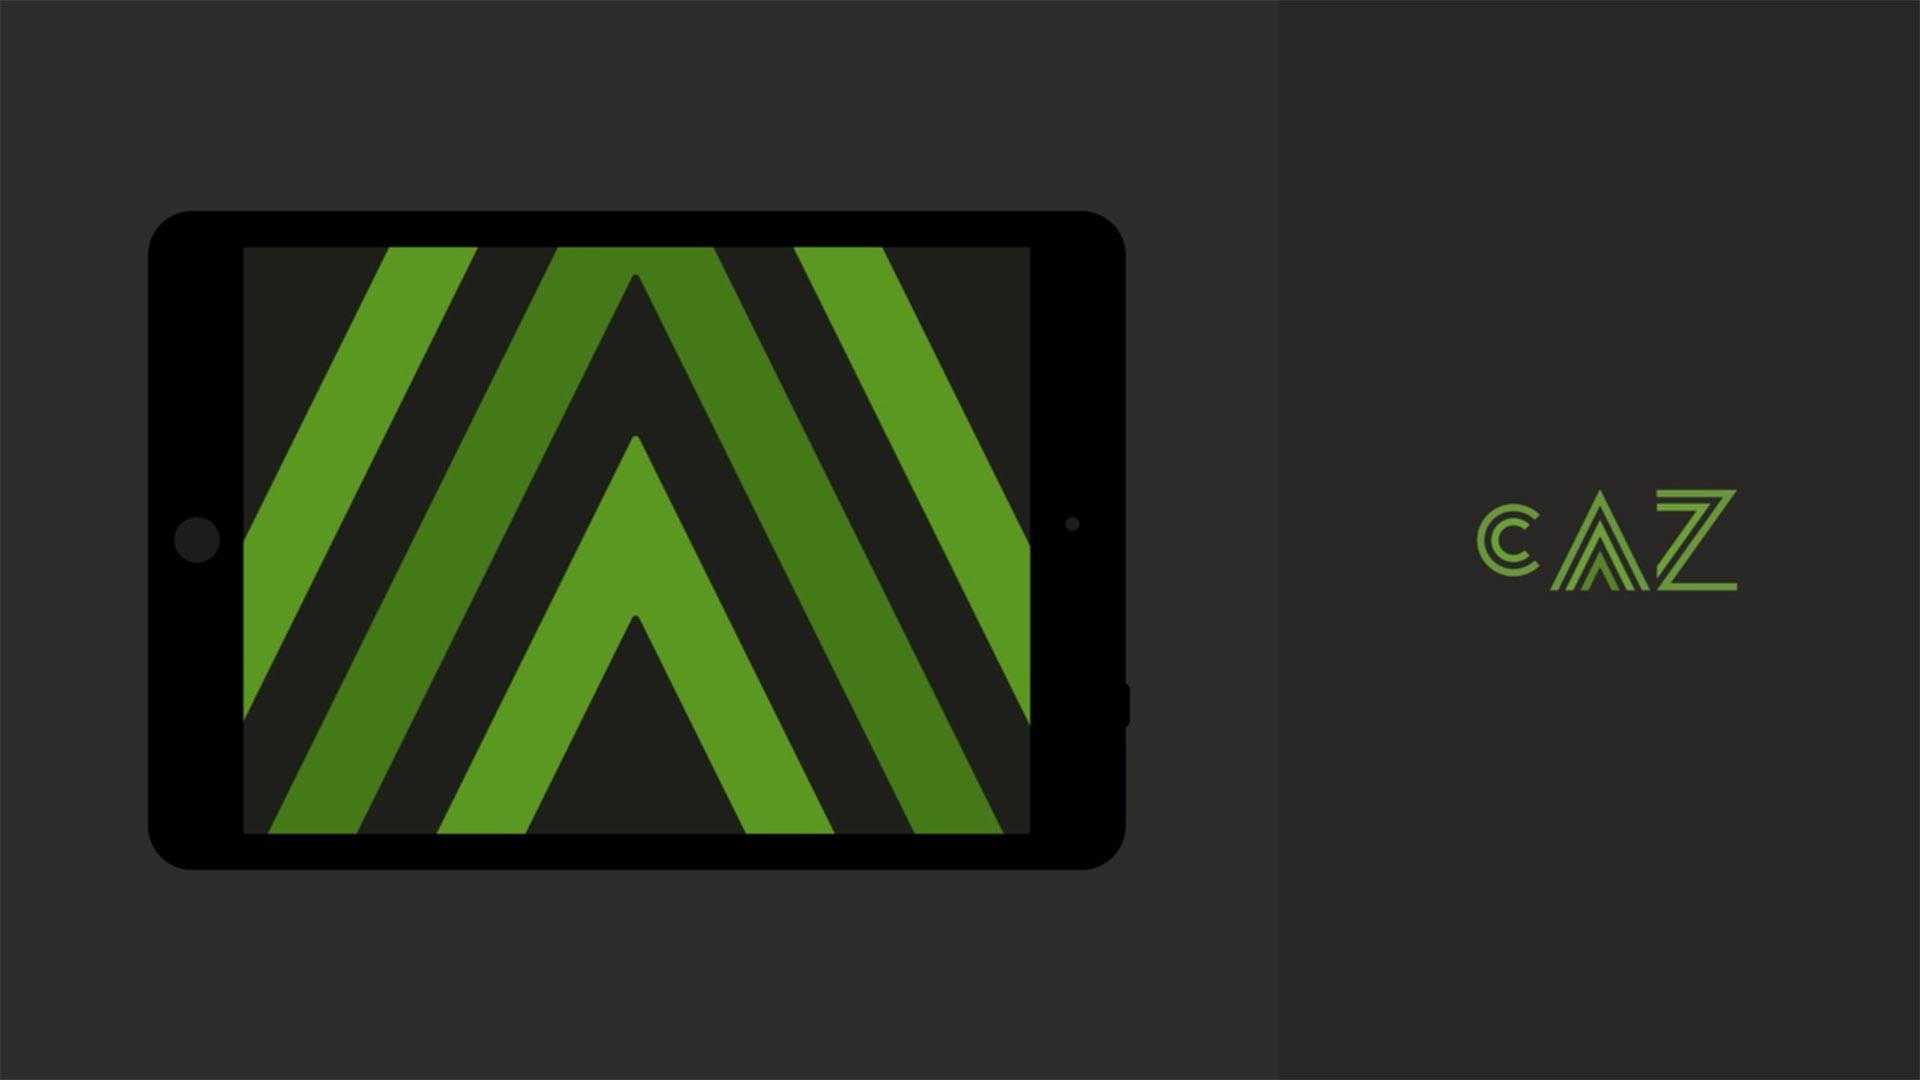 CAZ Tablet ipad logo animation